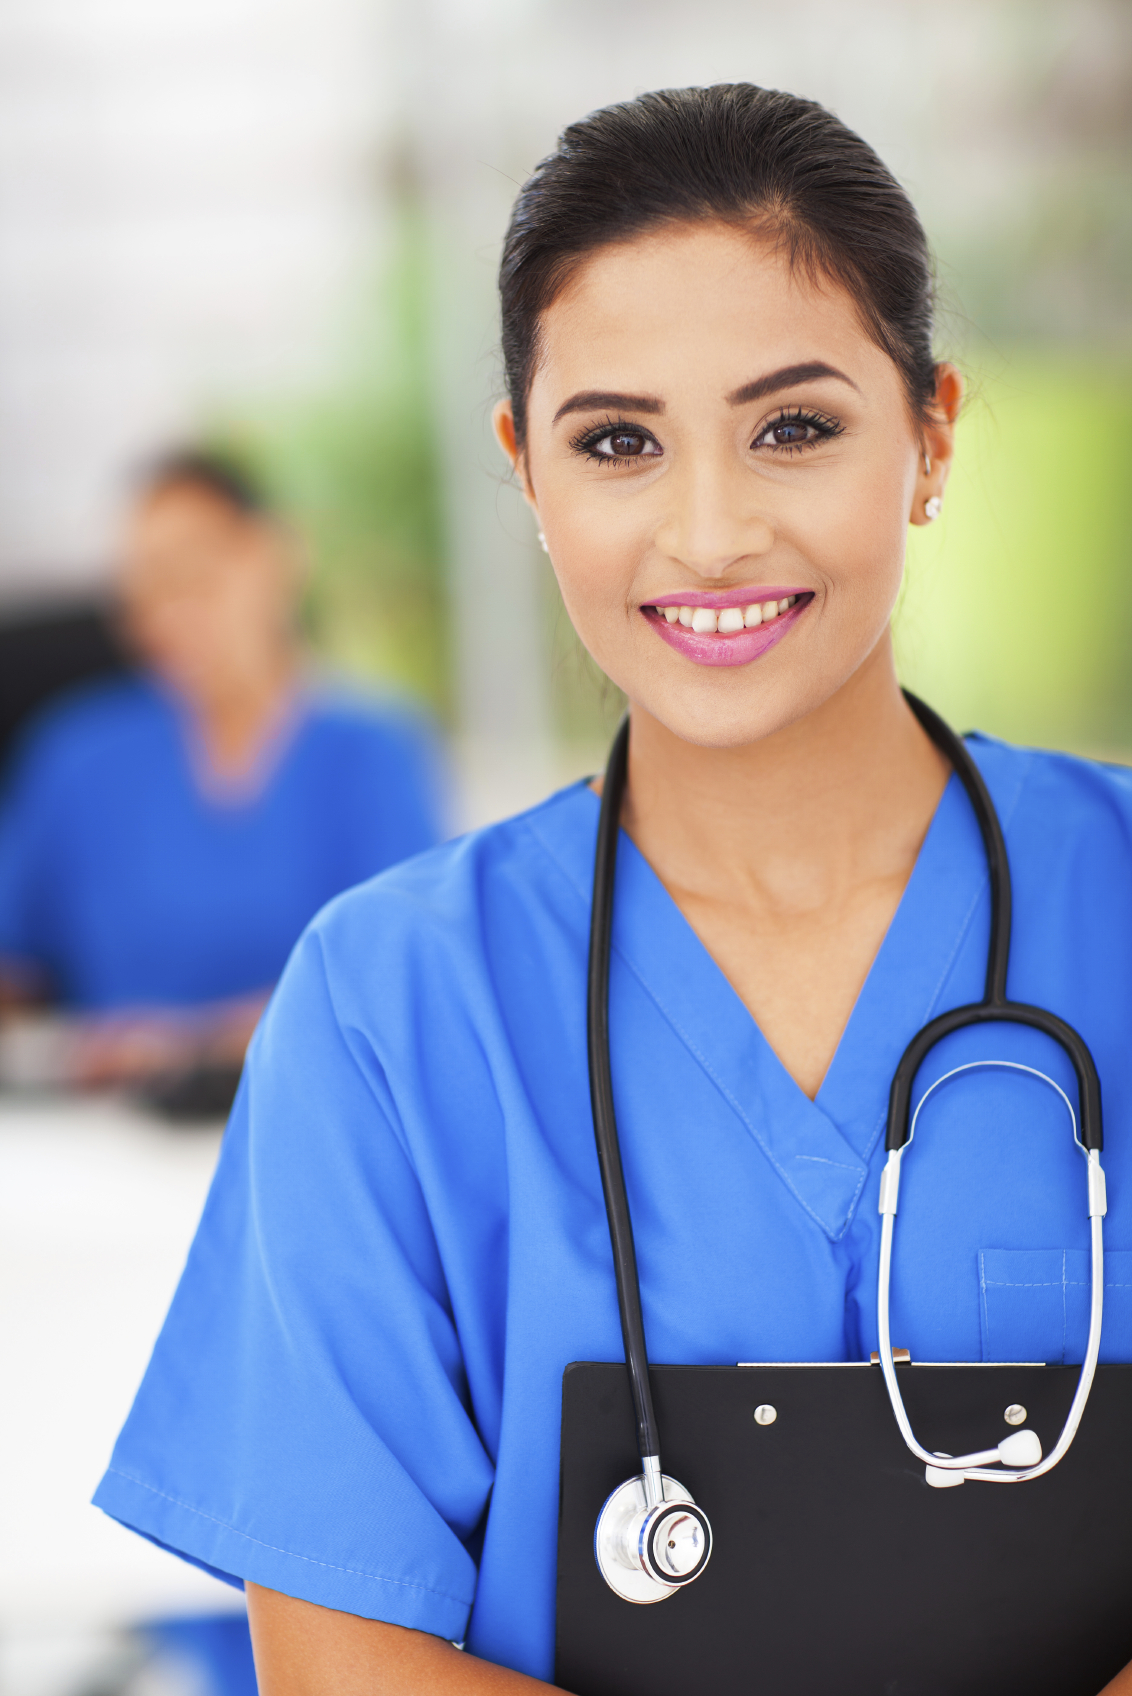 Clinical Medical Assistant Cma Program